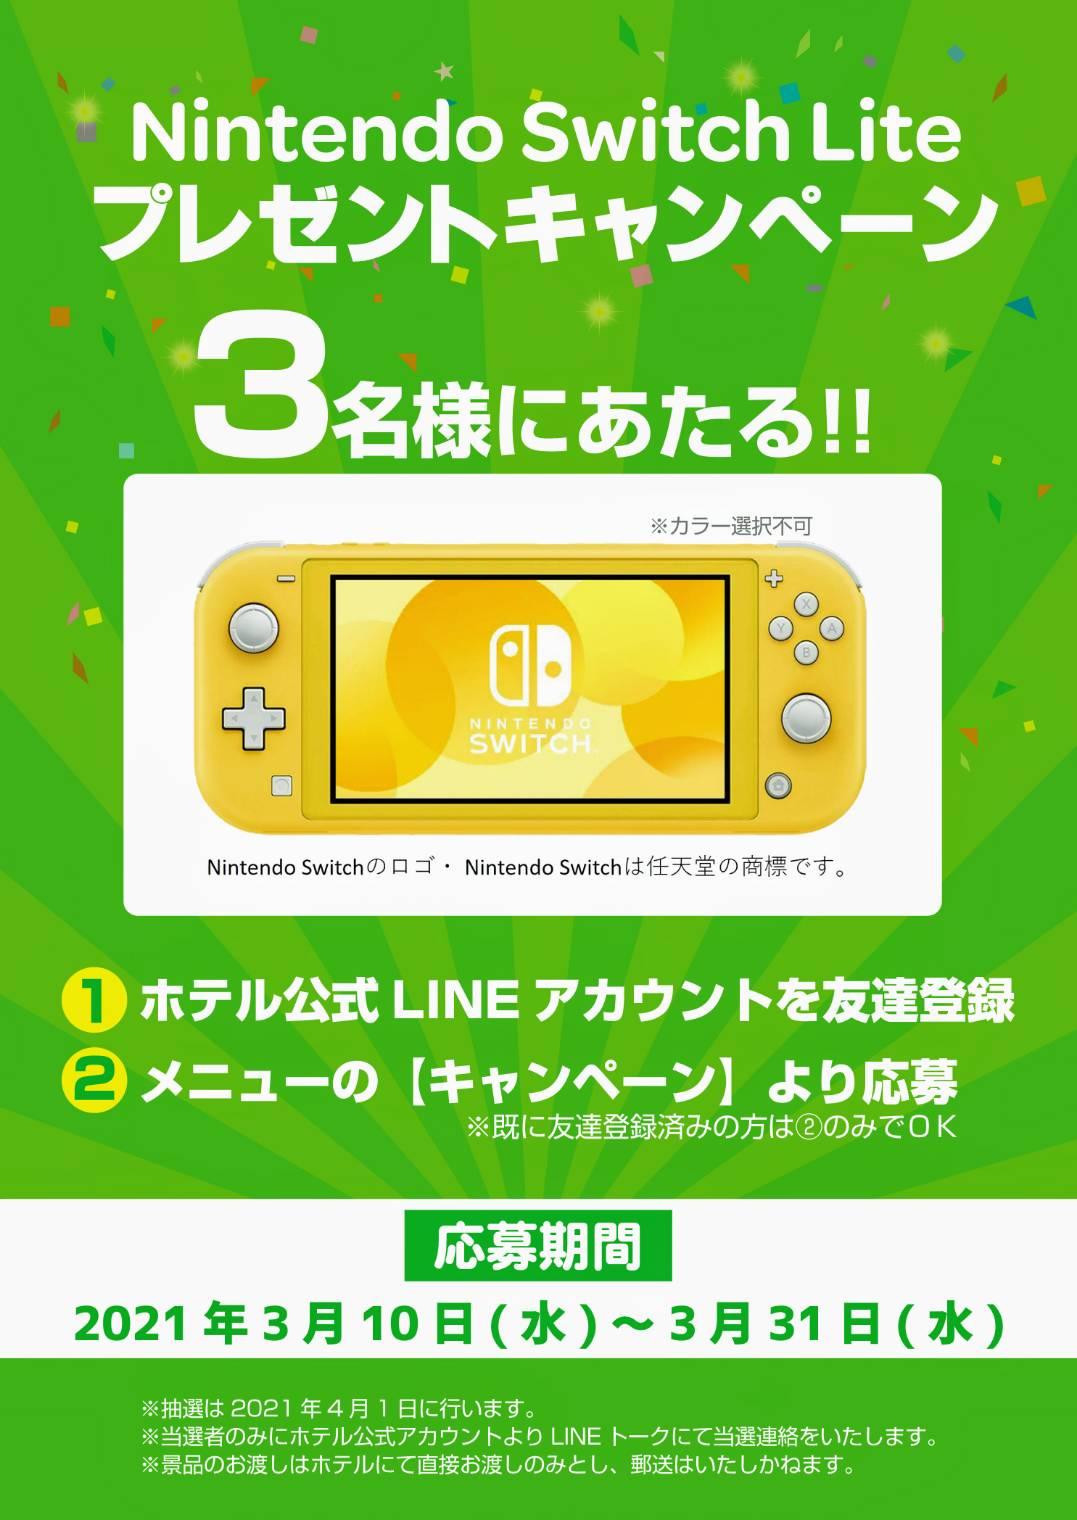 Nintendo Switch Liteプレゼントキャンペーン☆  当ホテルLINE公式